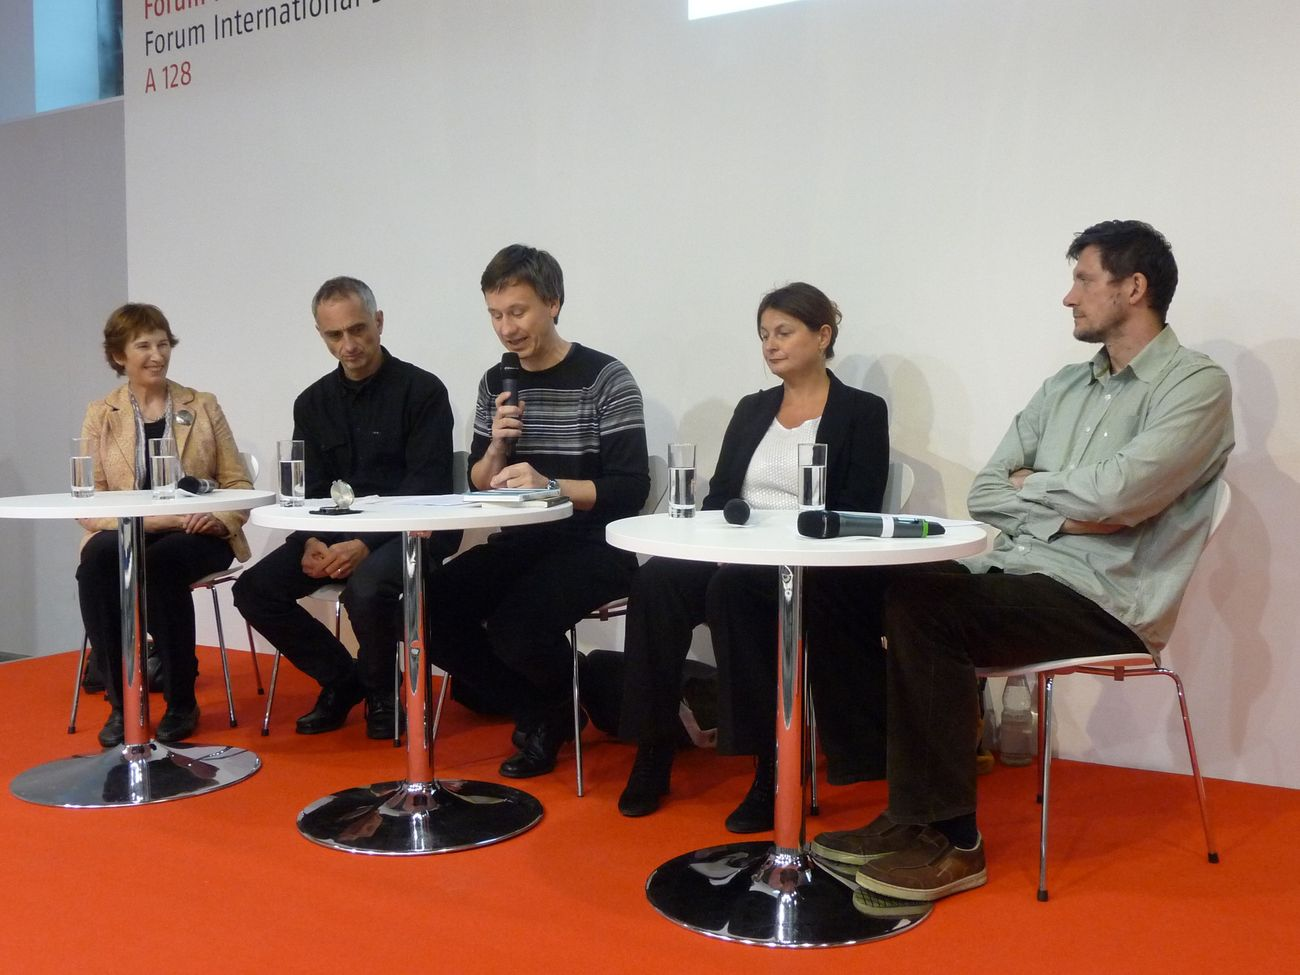 Diskusní fórum - Radka Denemarková, Radek Malý a Mirko Kraetsch